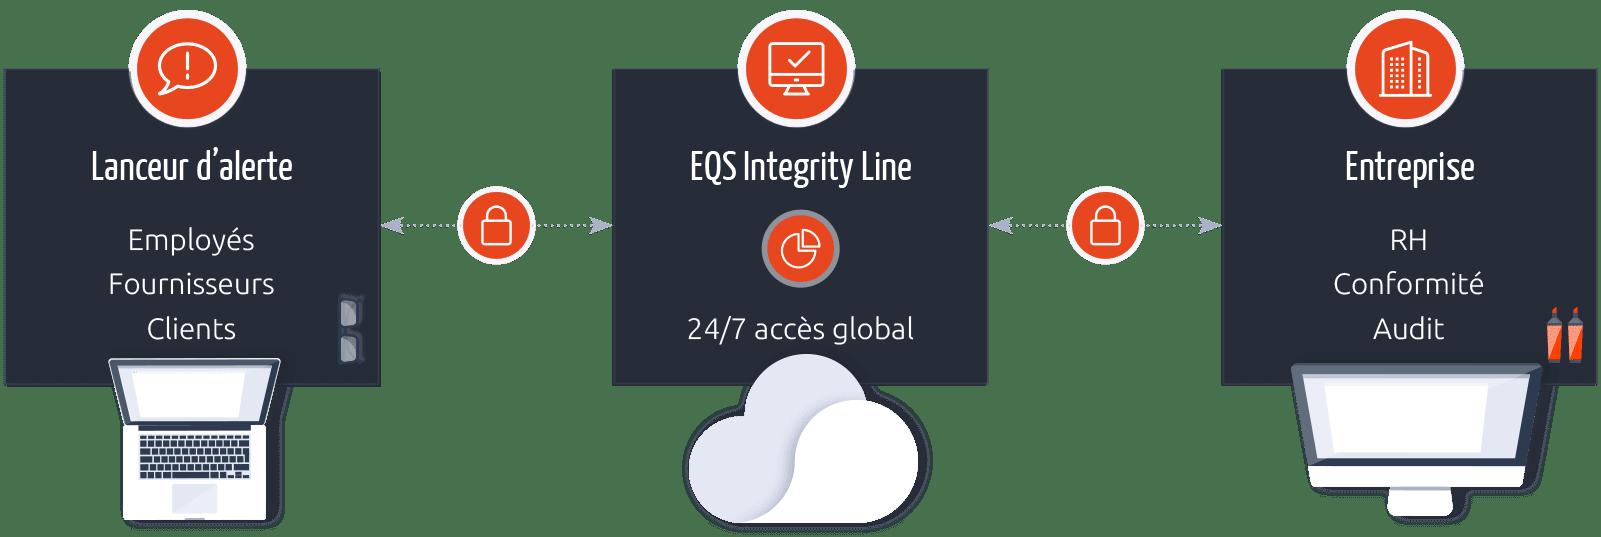 integrity_line-steps-dark